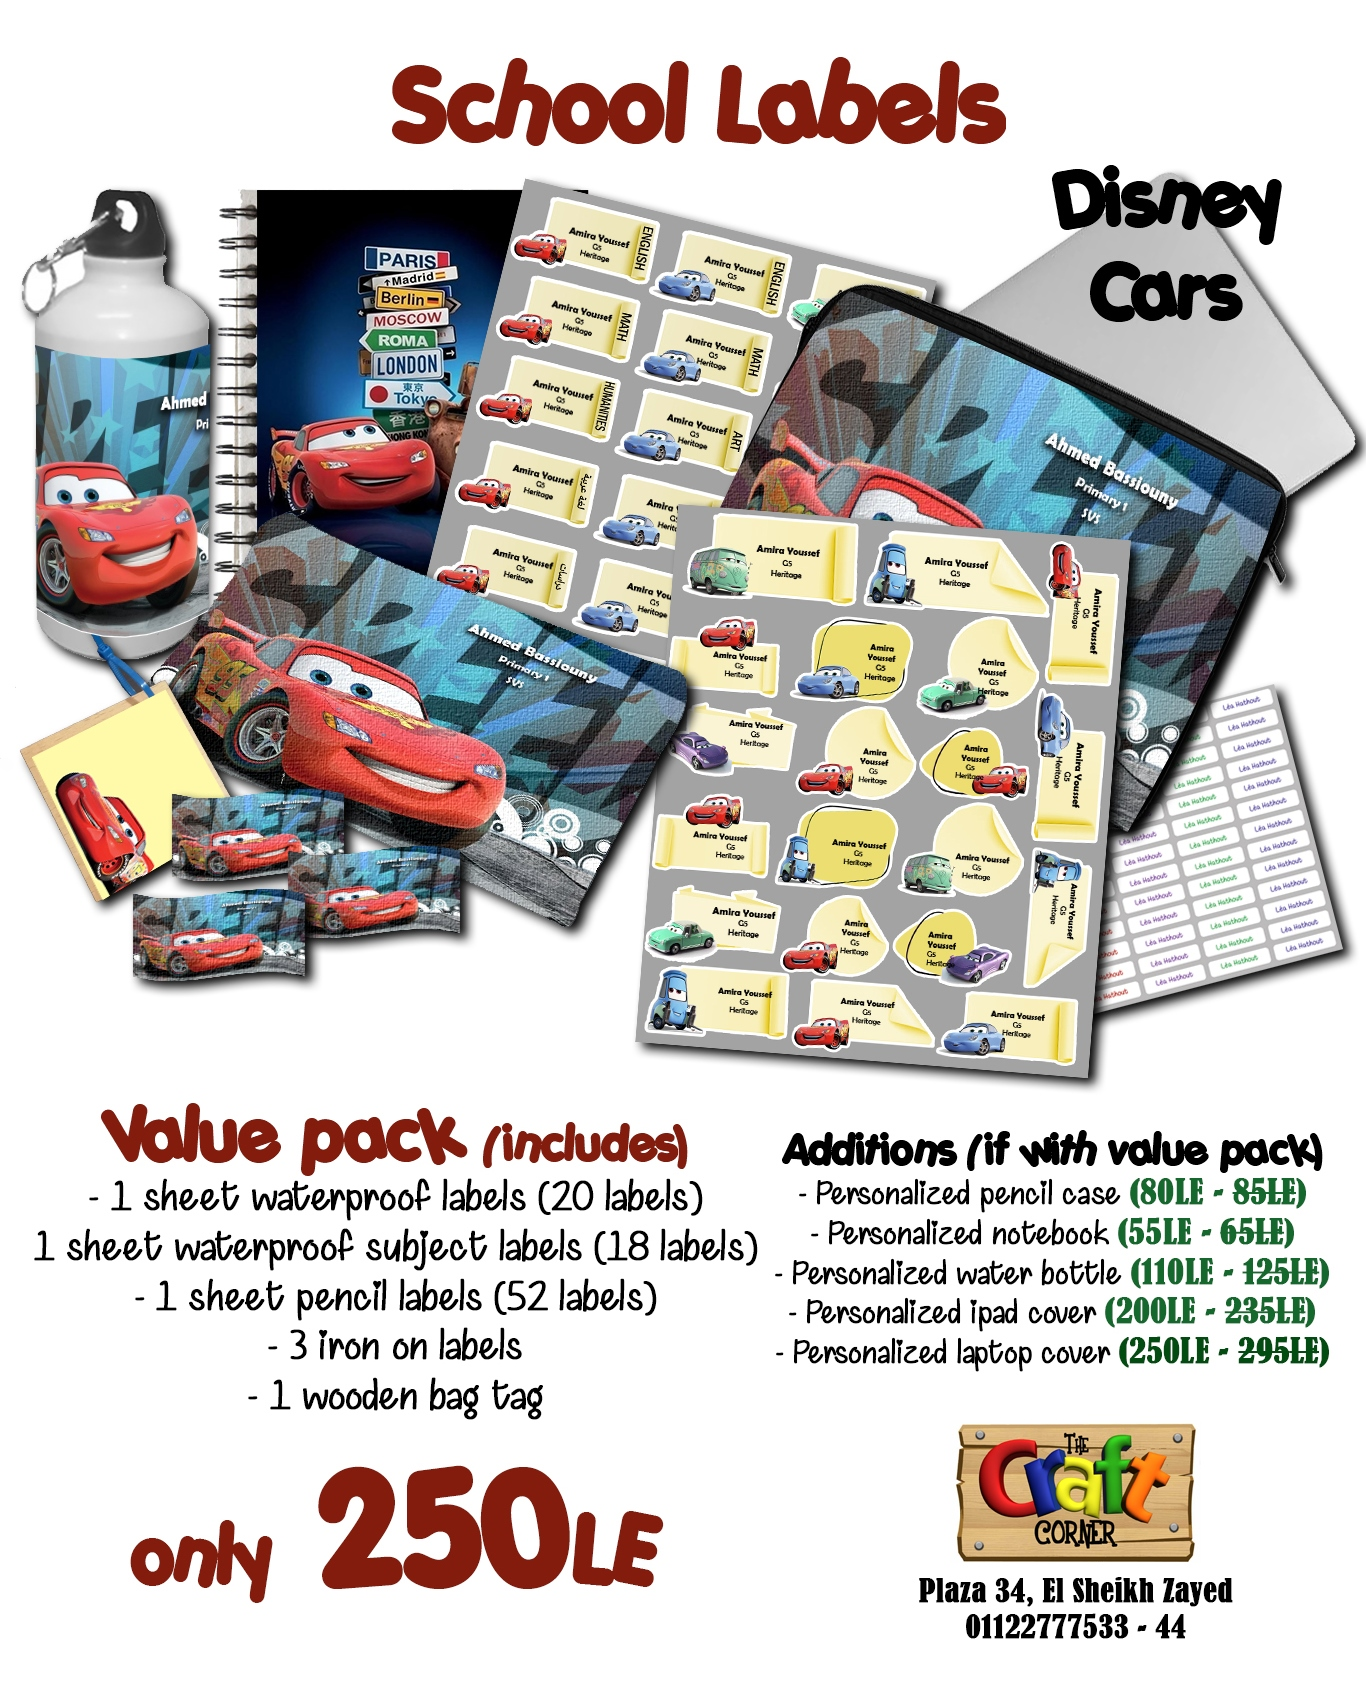 Disney cars ad